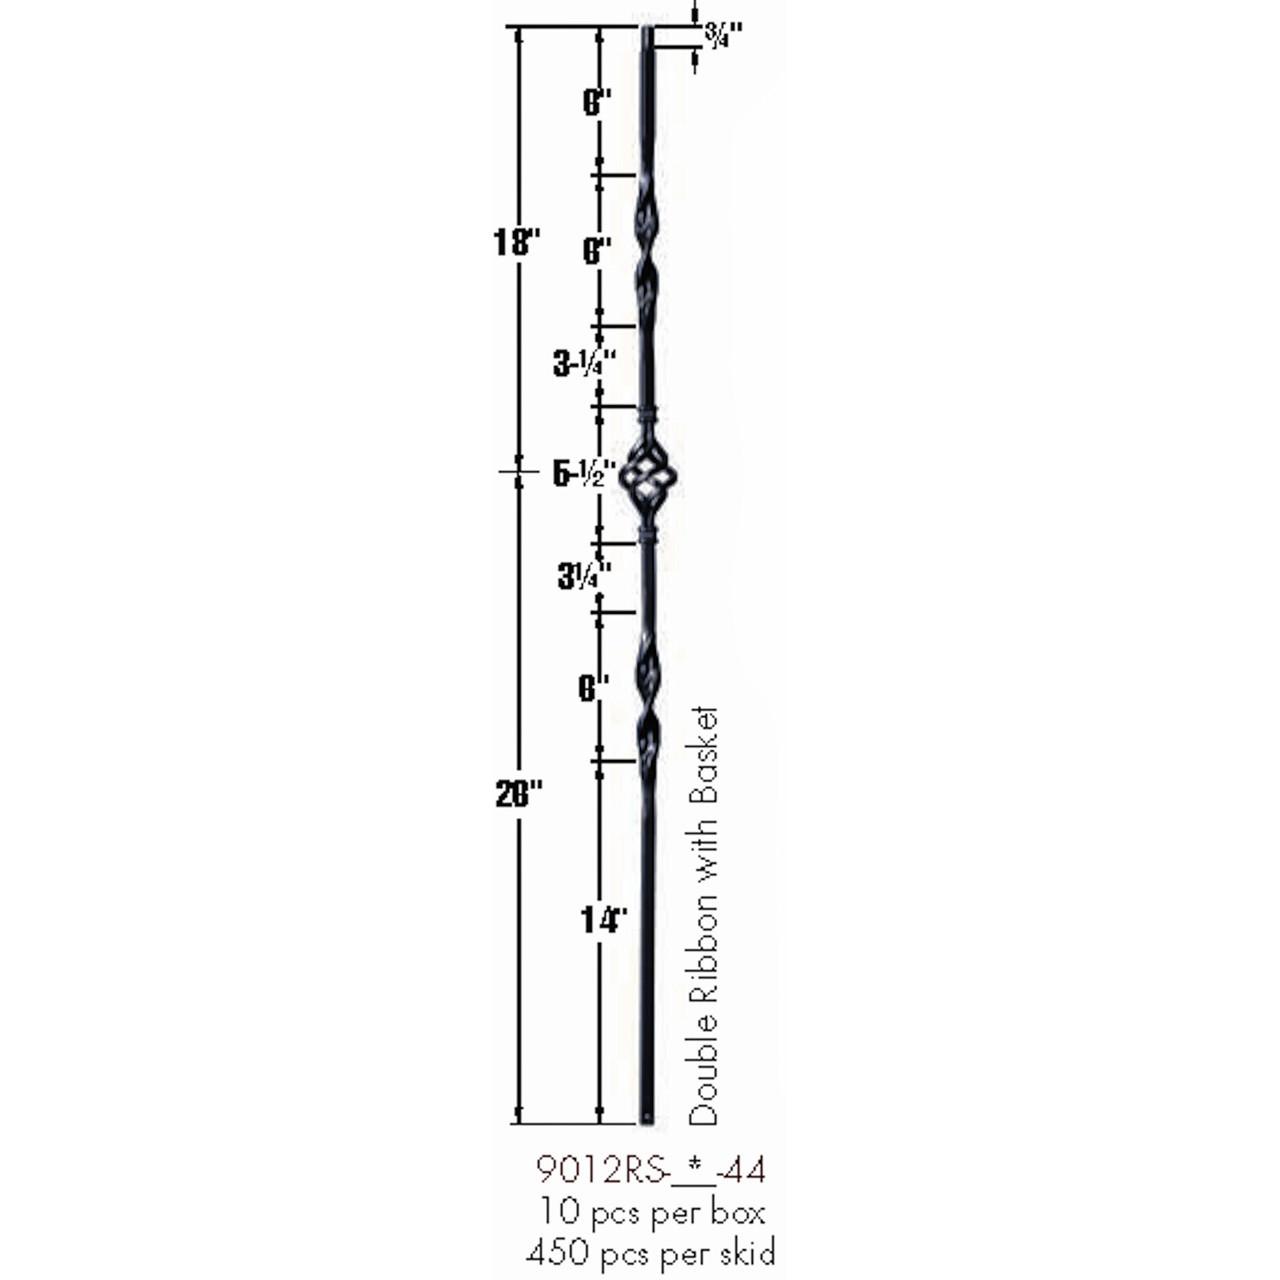 9012RS Double Ribbon Single Basket Tubular Steel Baluster Dimensional Information